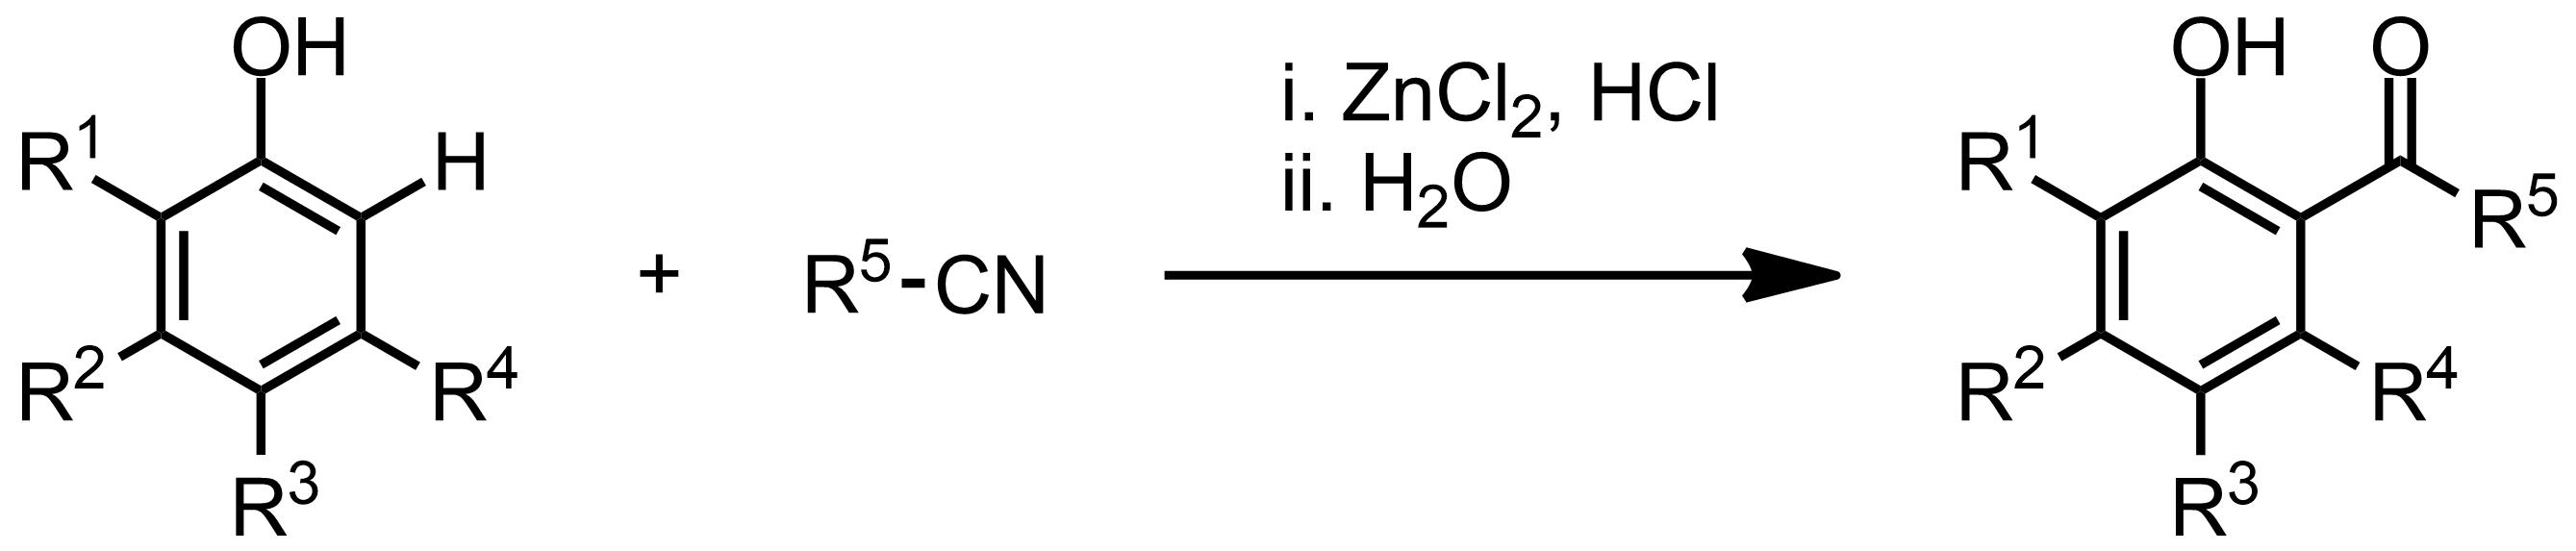 Schematic representation of the Houben-Hoesch Reaction.